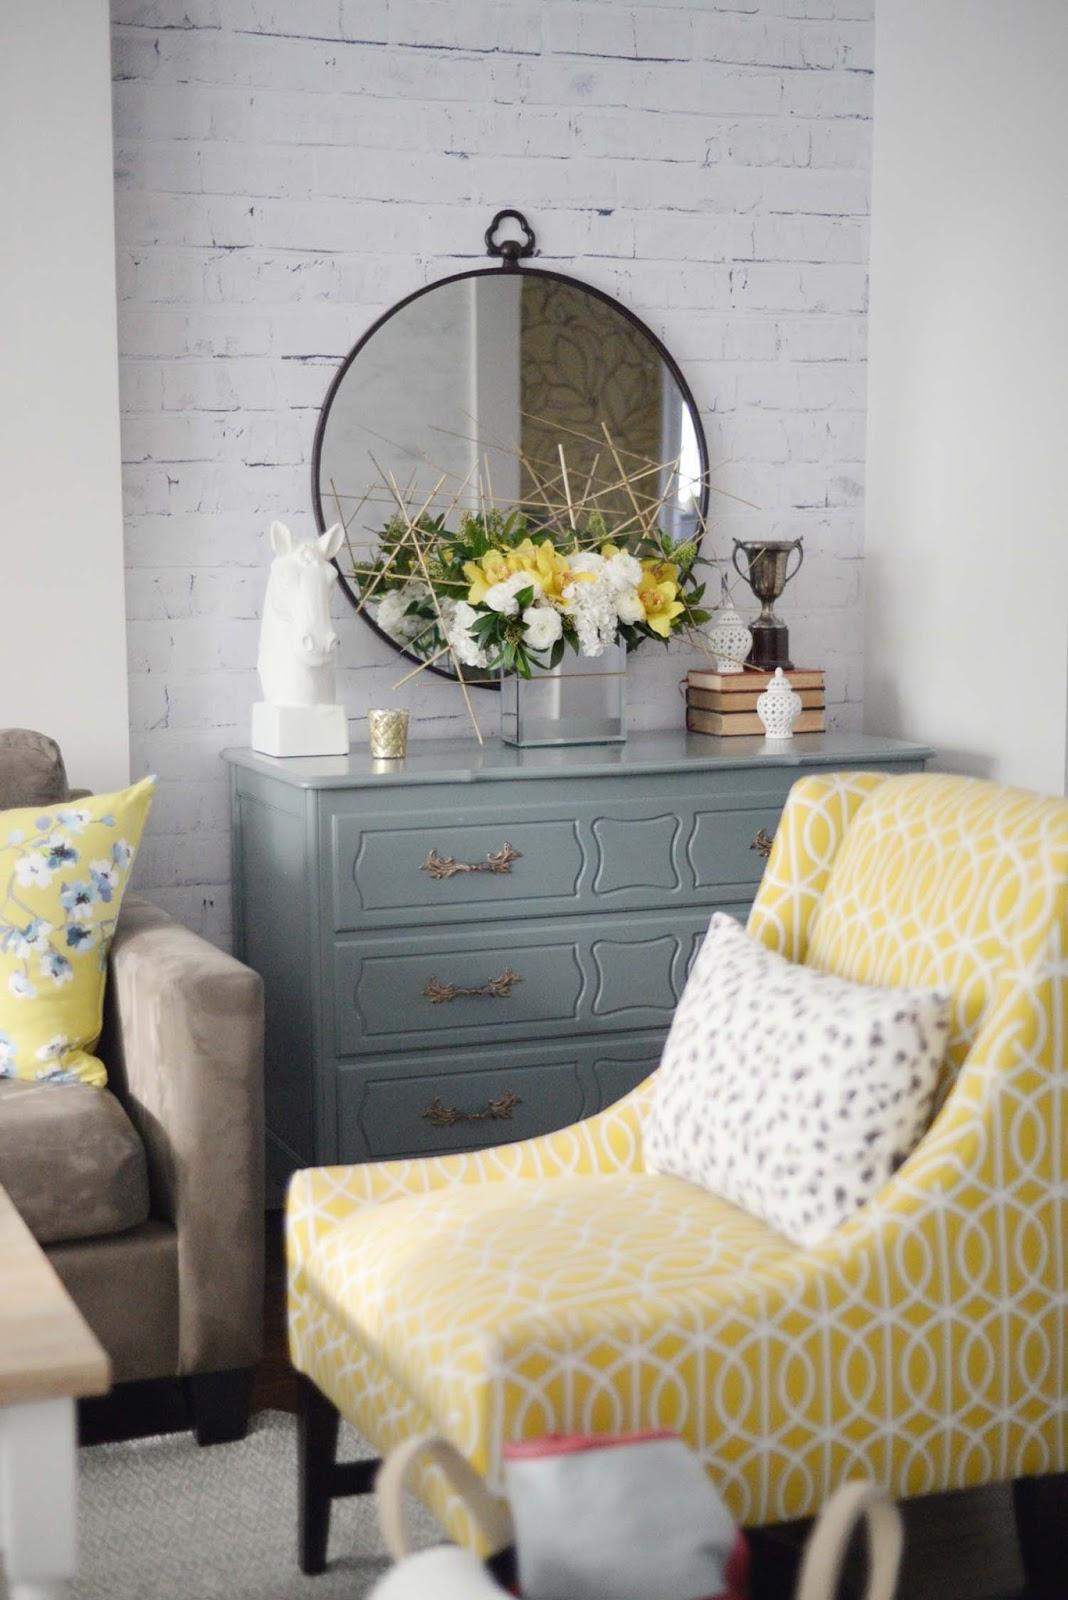 Wayfair Winter Refresh | round metal mirror | floral art | yellow teal white | RamblingRenovators.ca